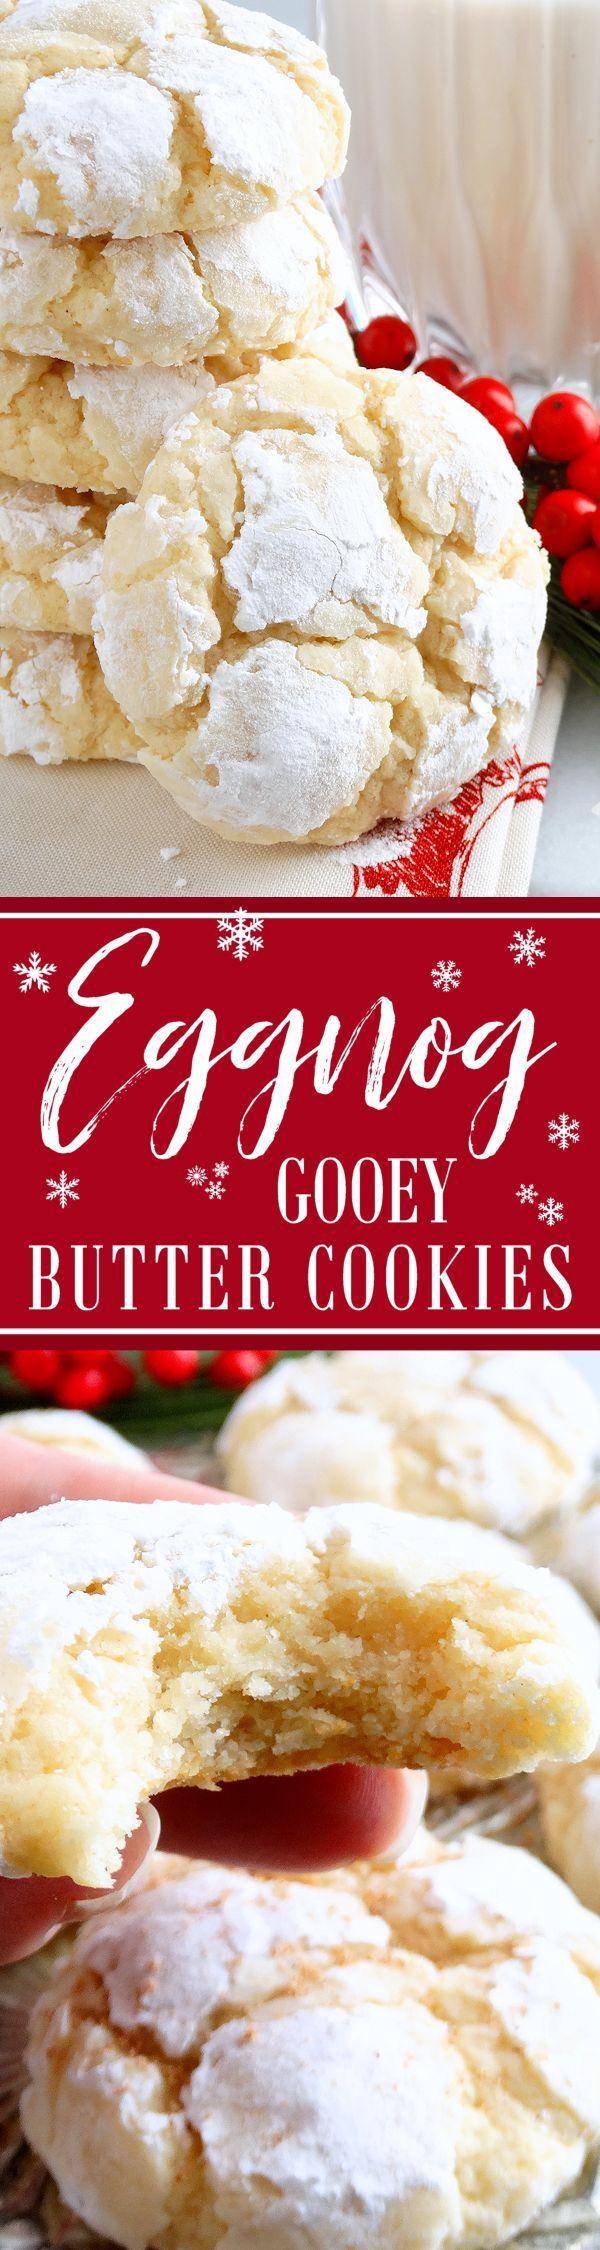 recipe: gooey butter cookies from scratch [34]